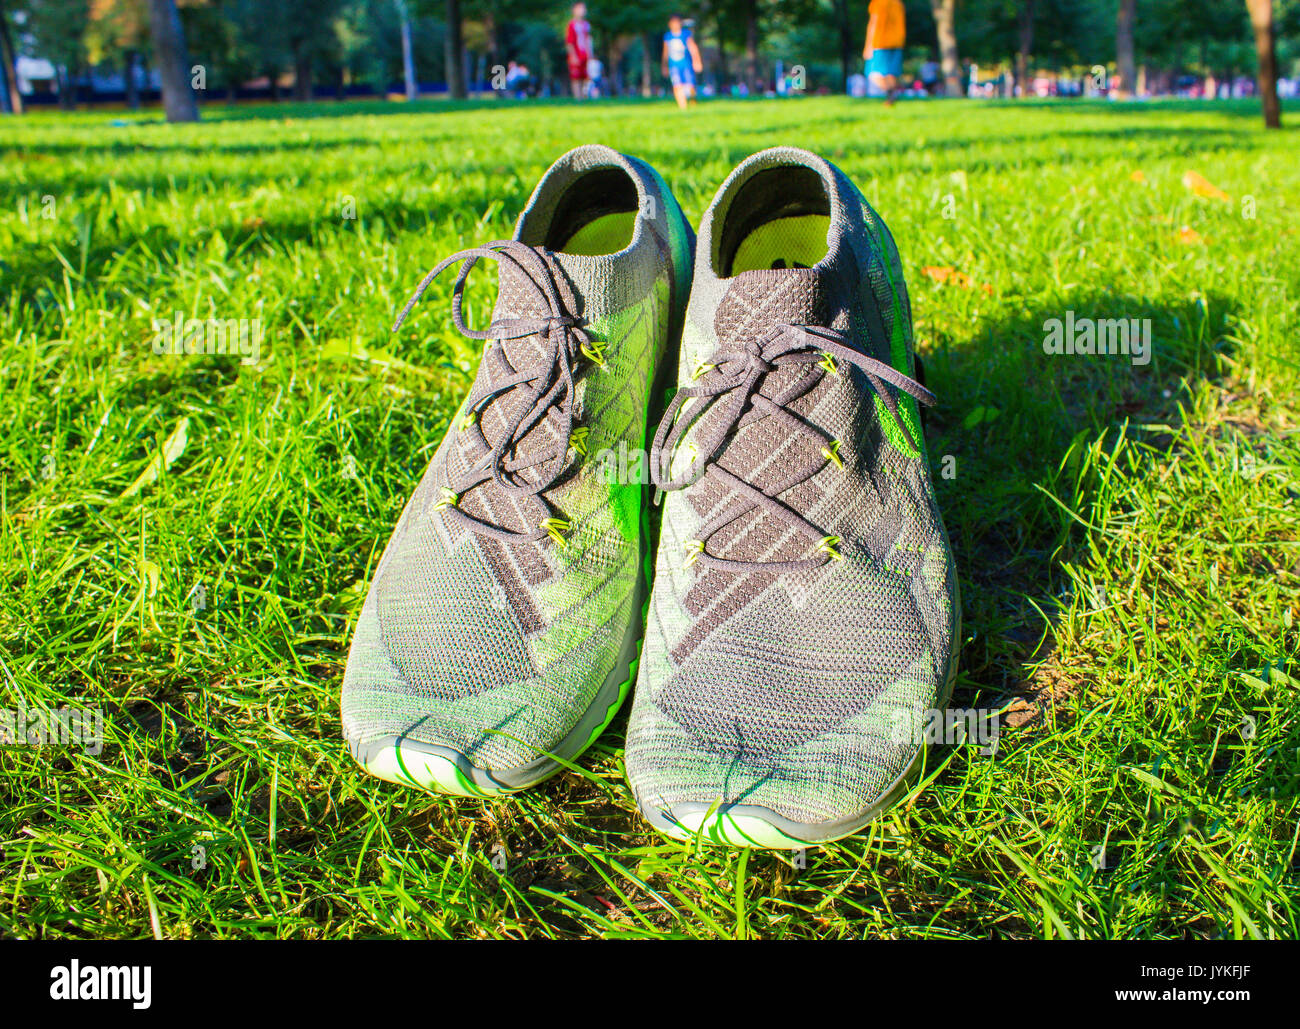 Dnepropetrovsk, Ukraine - 21 août, 2016: Nouveau style chaussures Nike sur l'herbe verte - exemple editorial Photo Stock